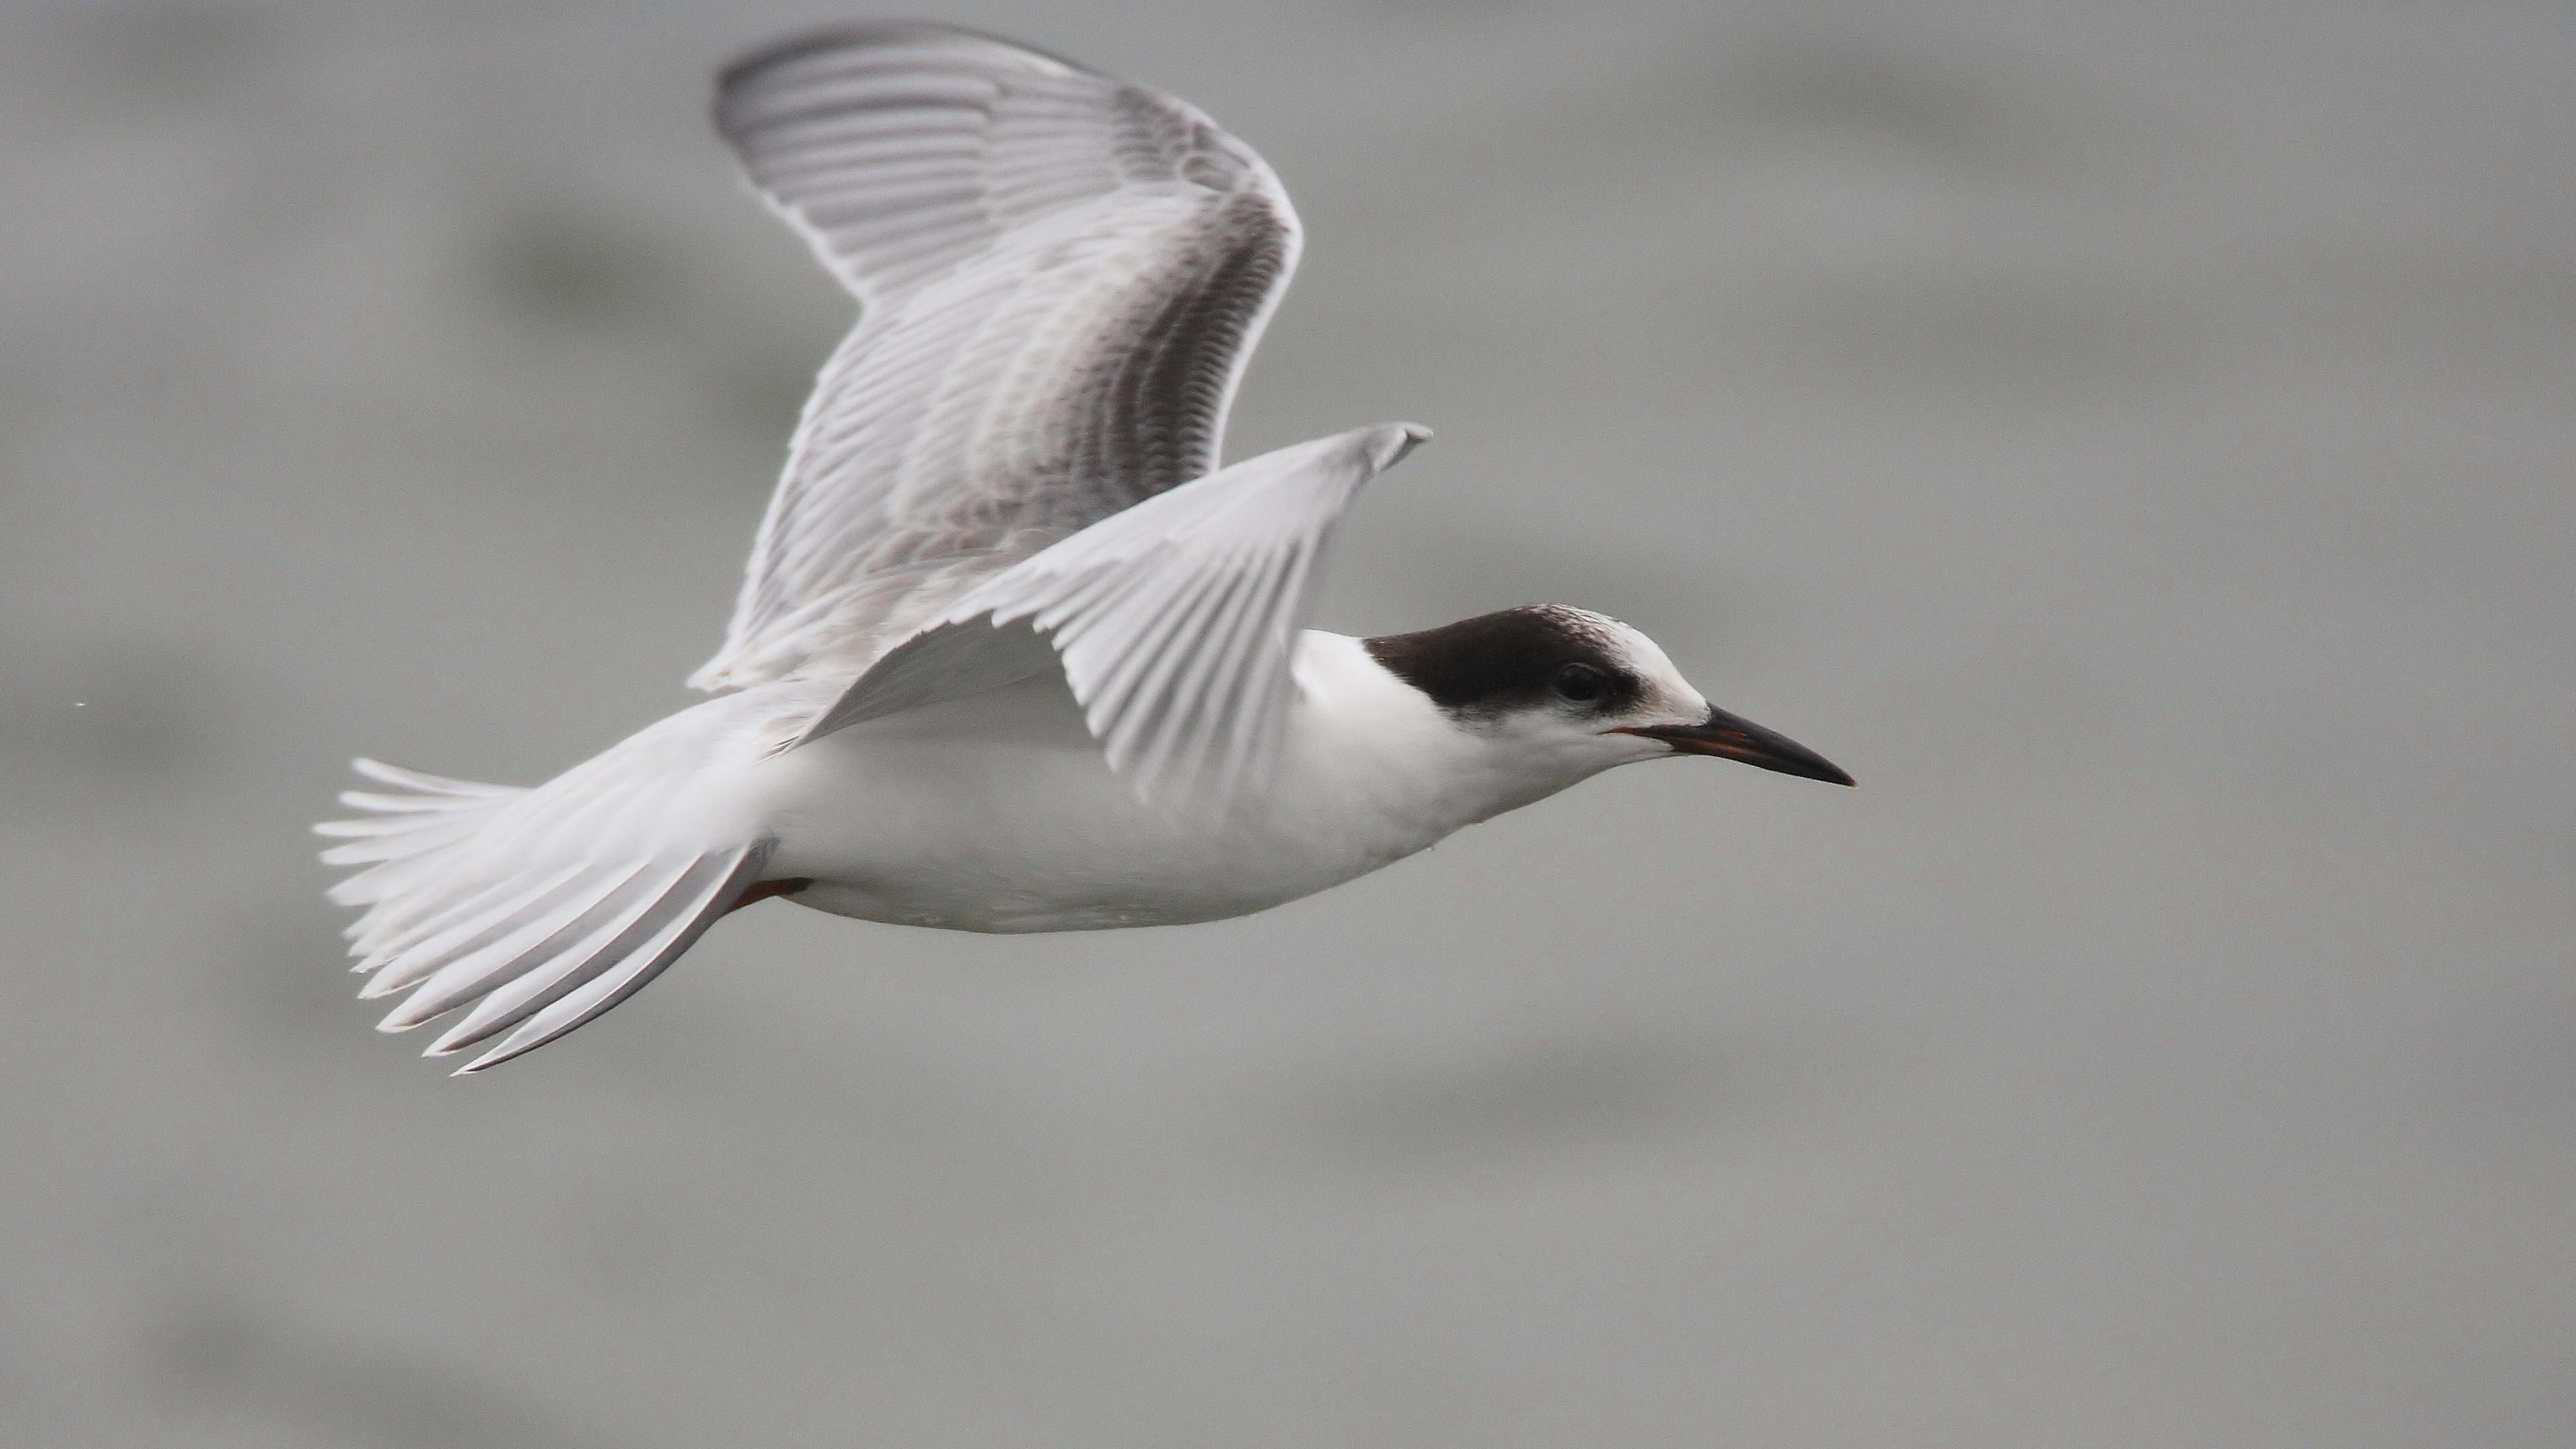 seagull flying sea 4k 1542242657 - seagull, flying, sea 4k - Seagull, Sea, Flying